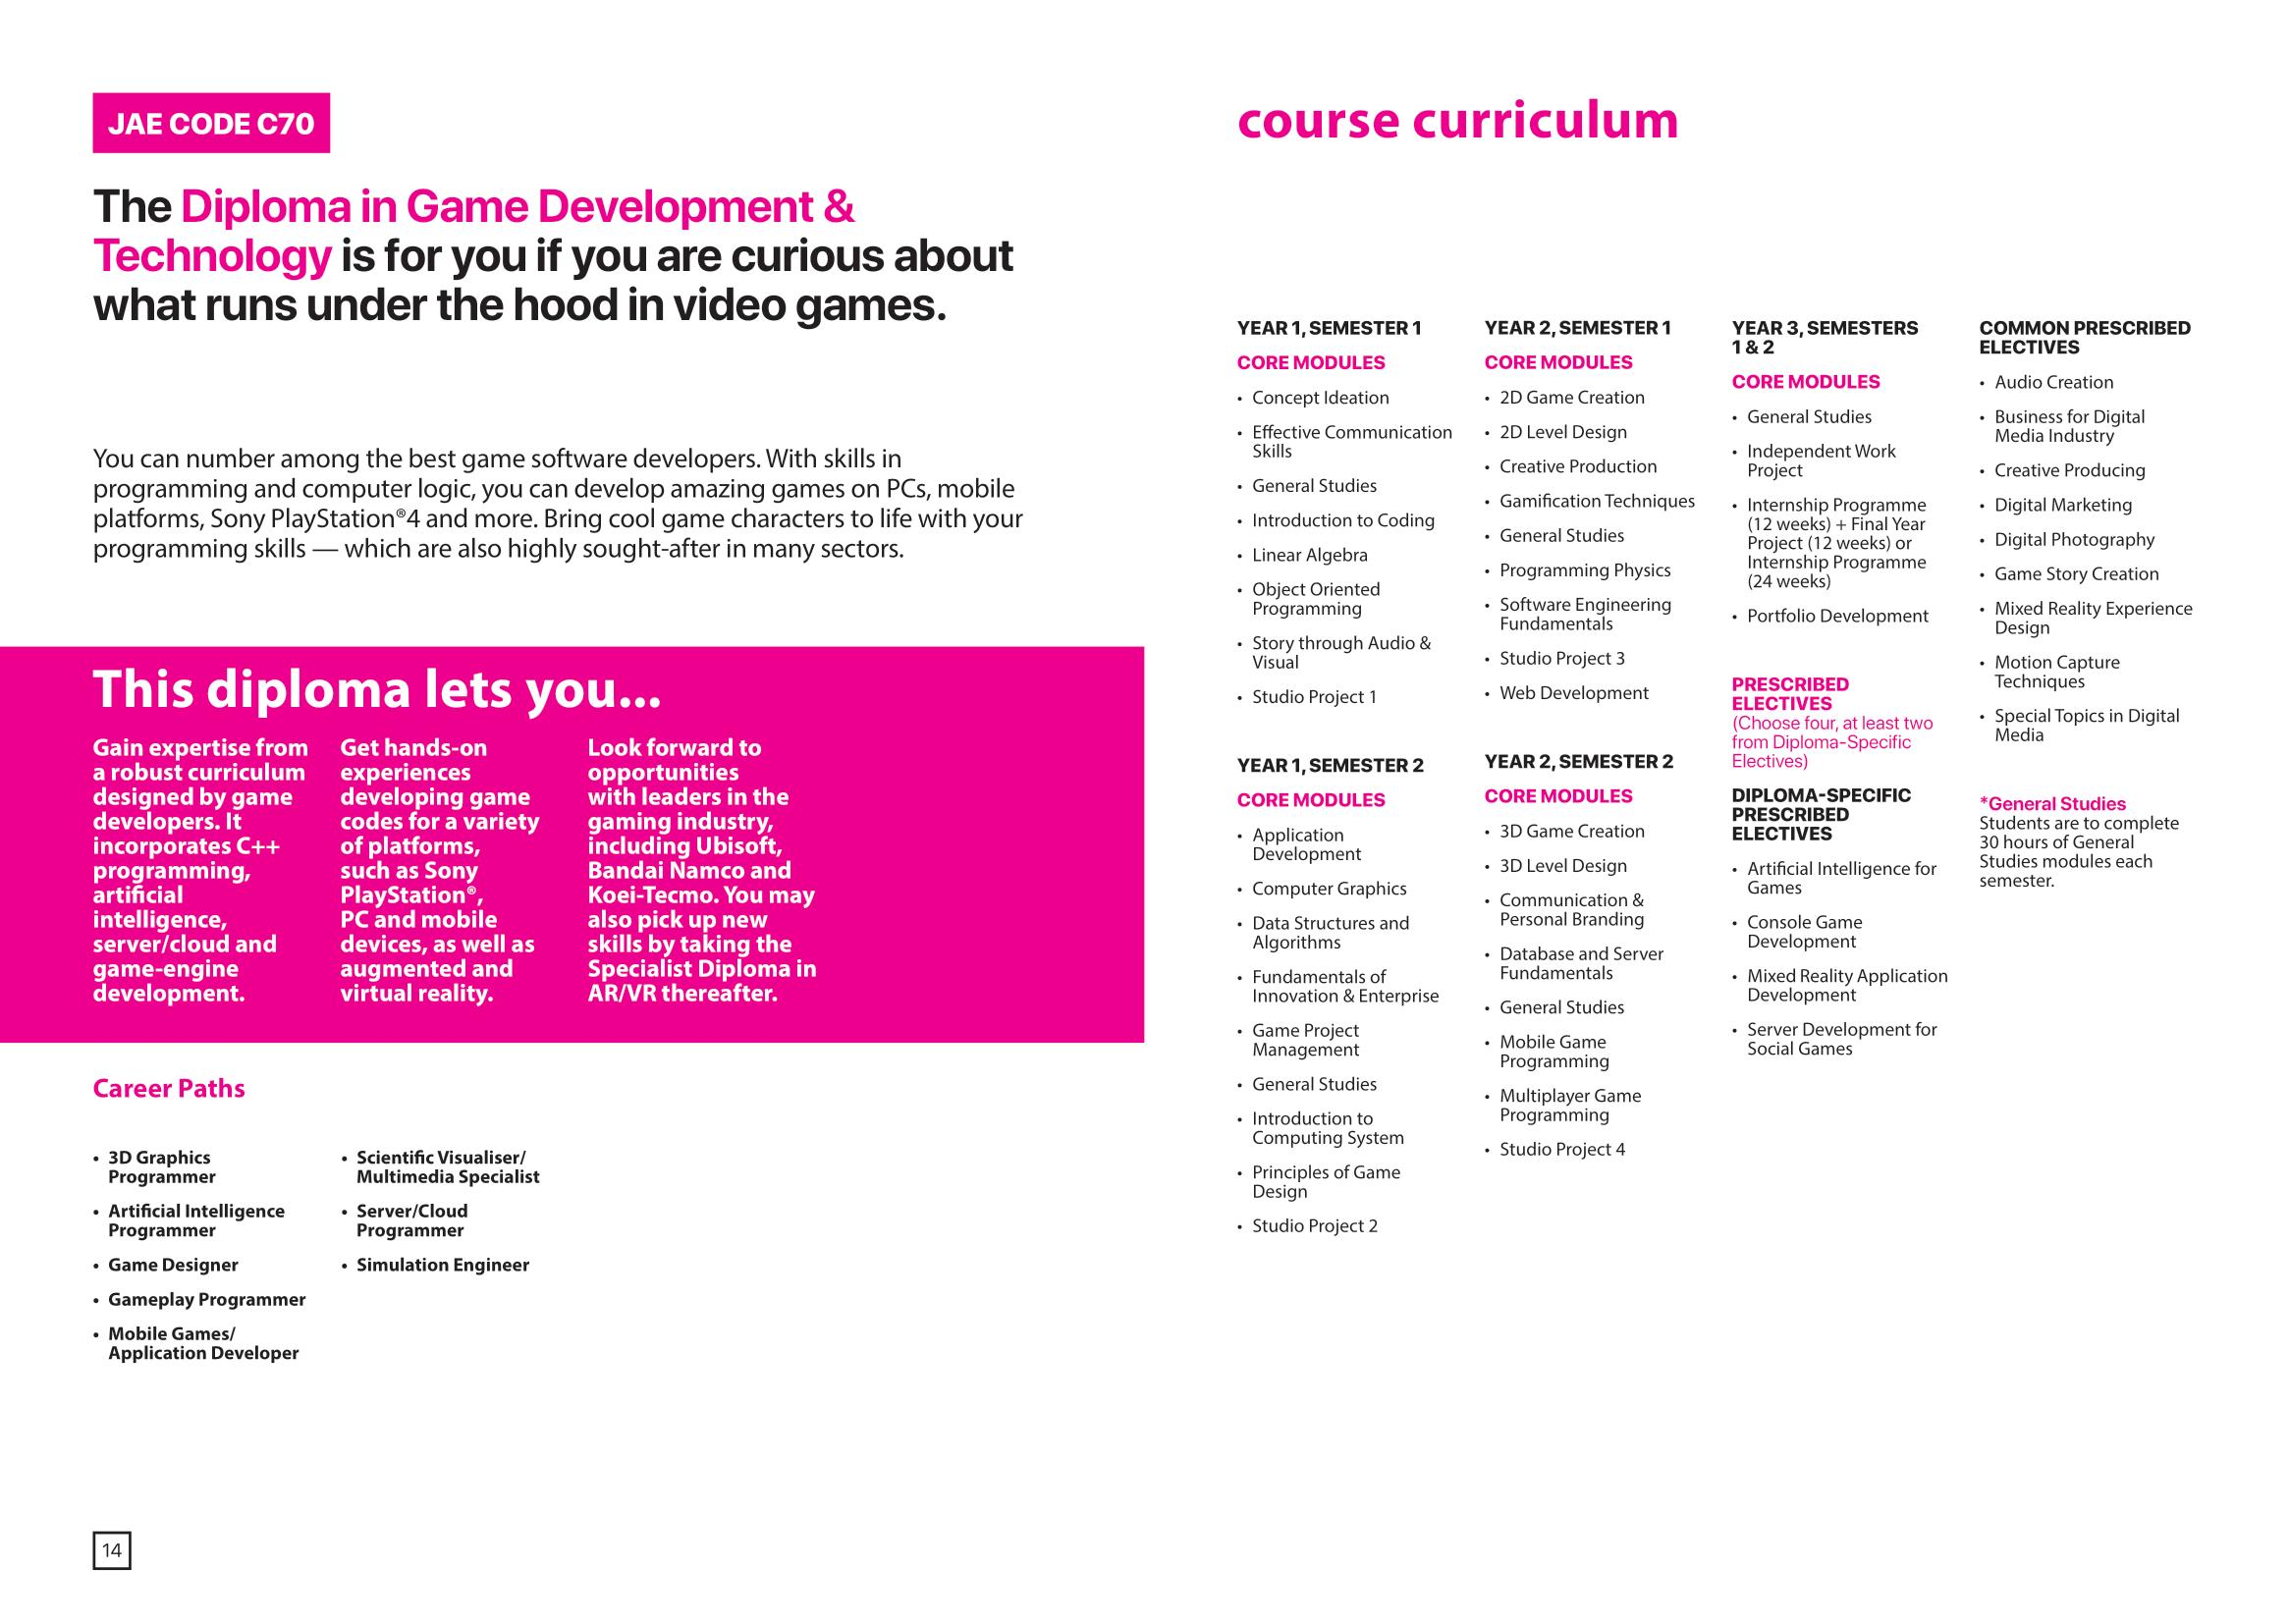 School of Interactive and Digital Media 2020-09